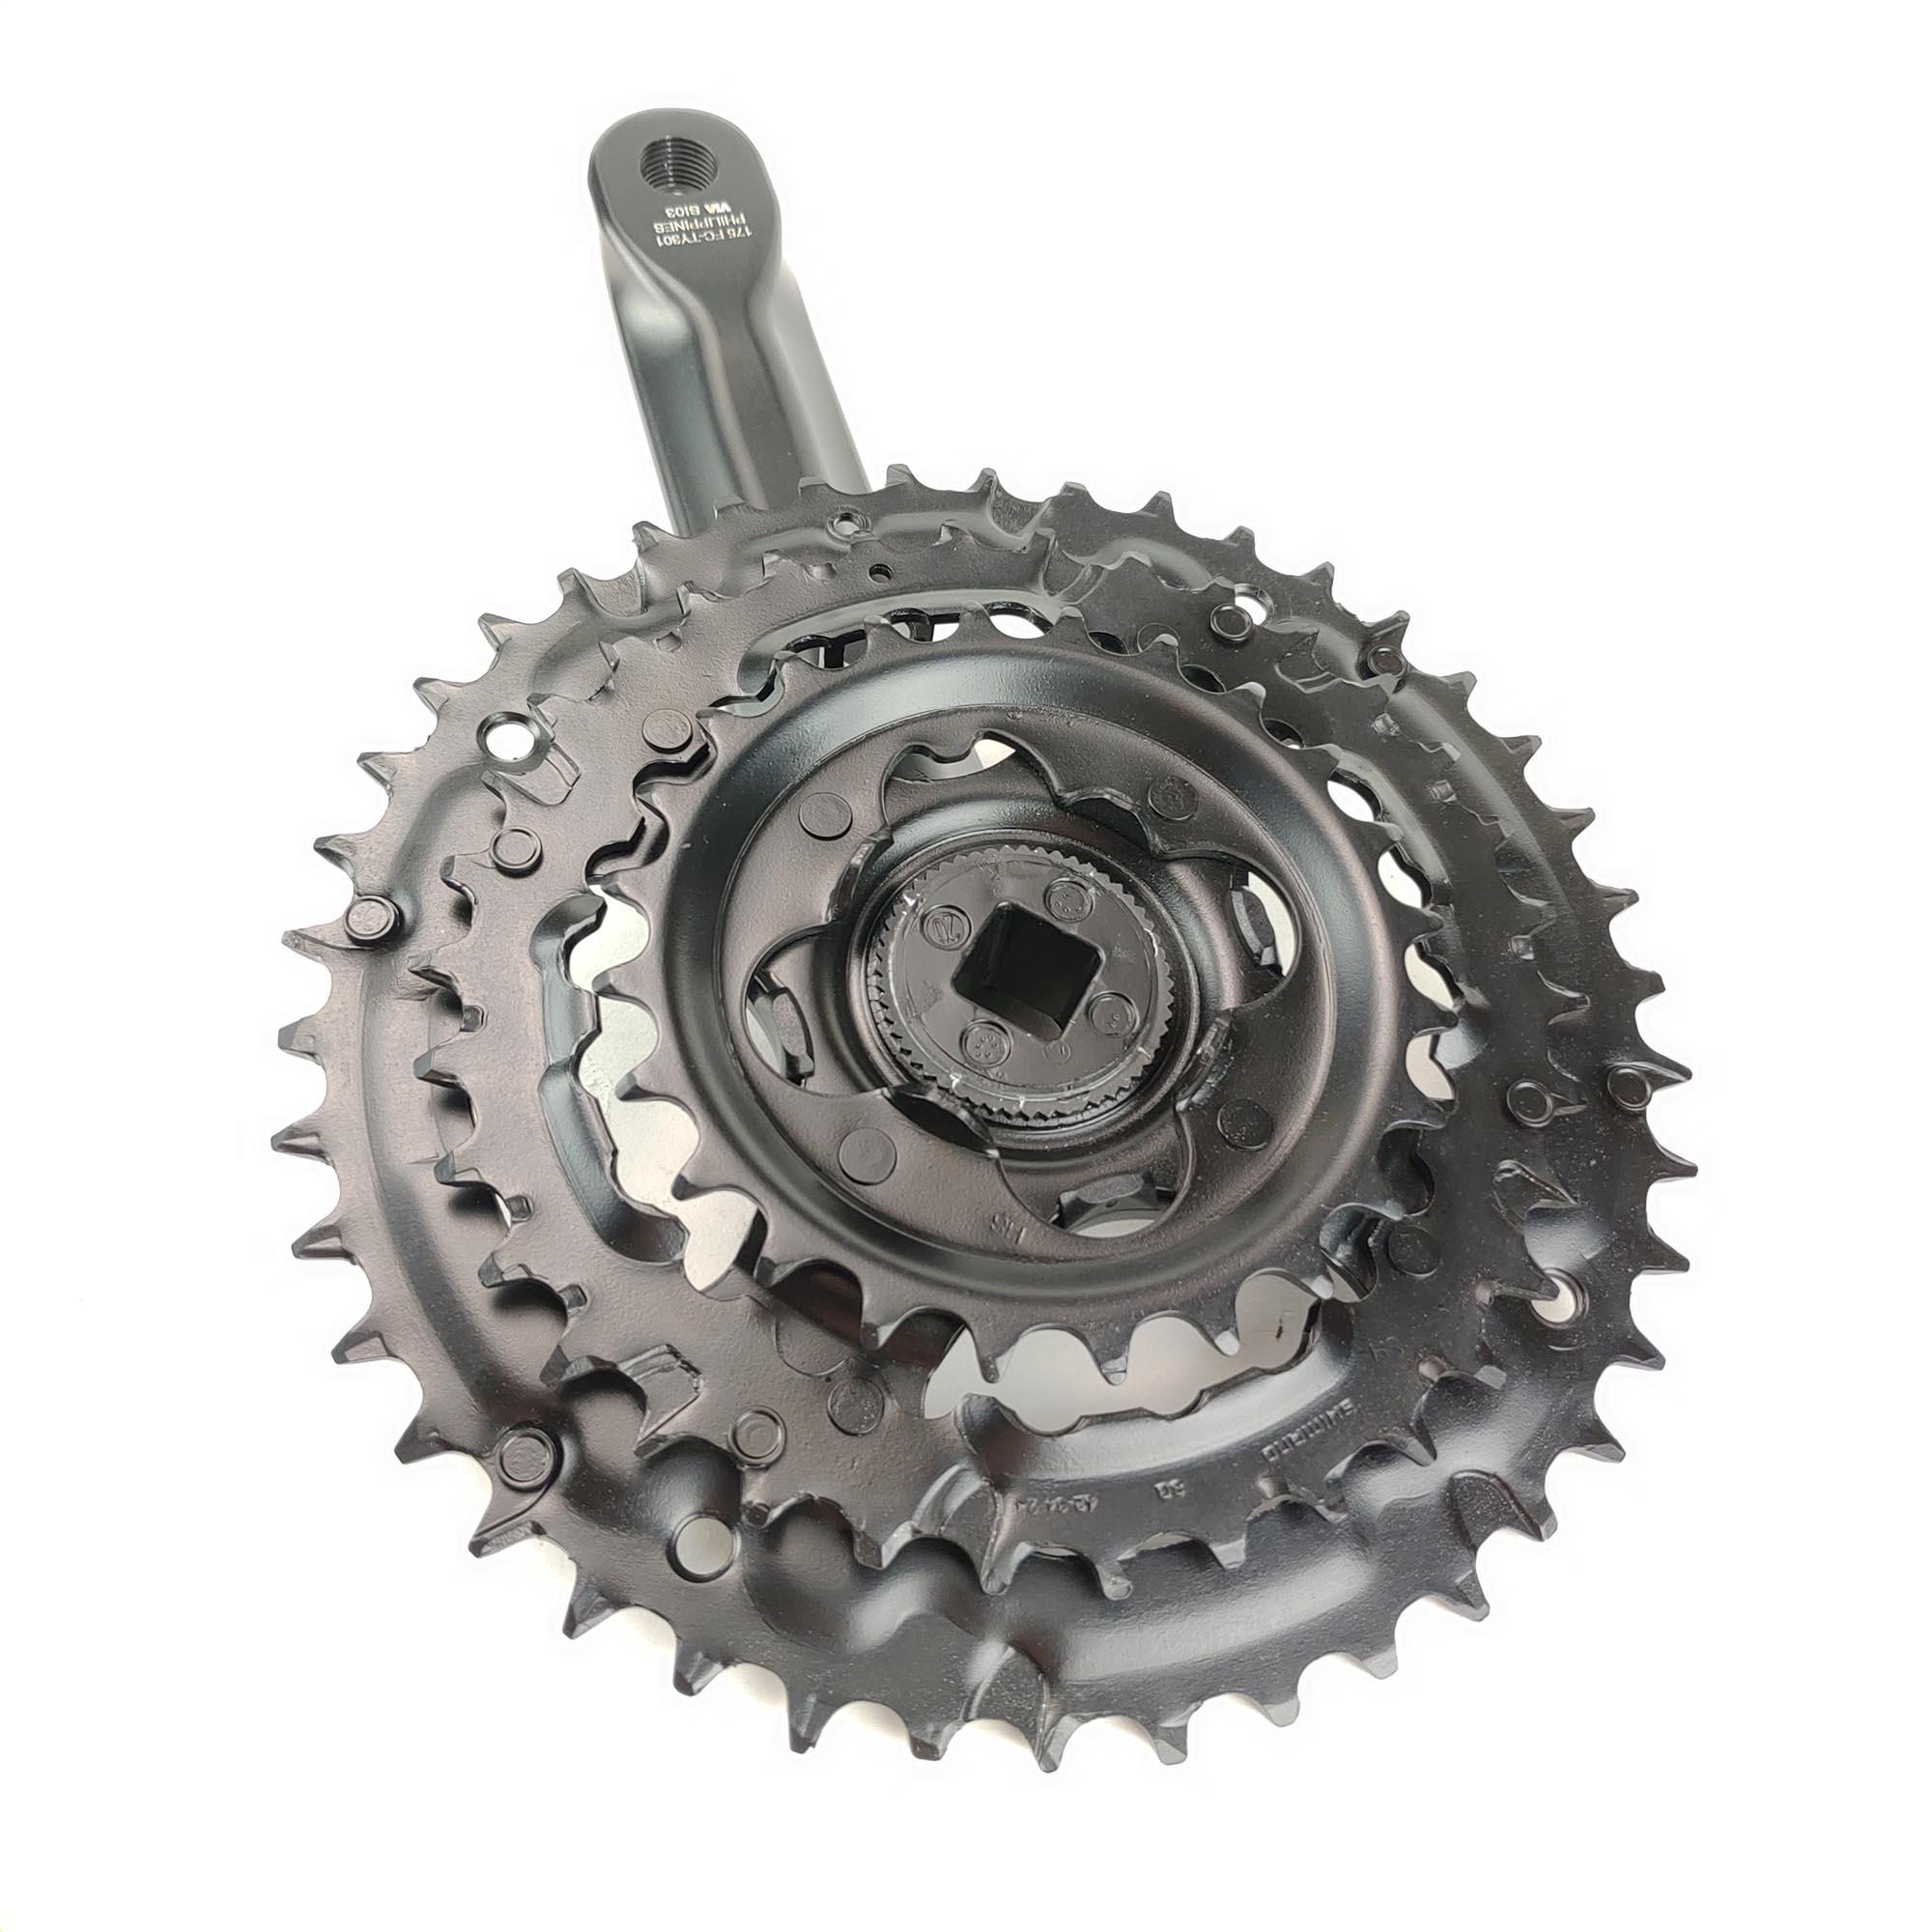 Pedivela Bike Triplo Shimano Engrenagem 24_34_42 Ty-301 8v Preto 170mm